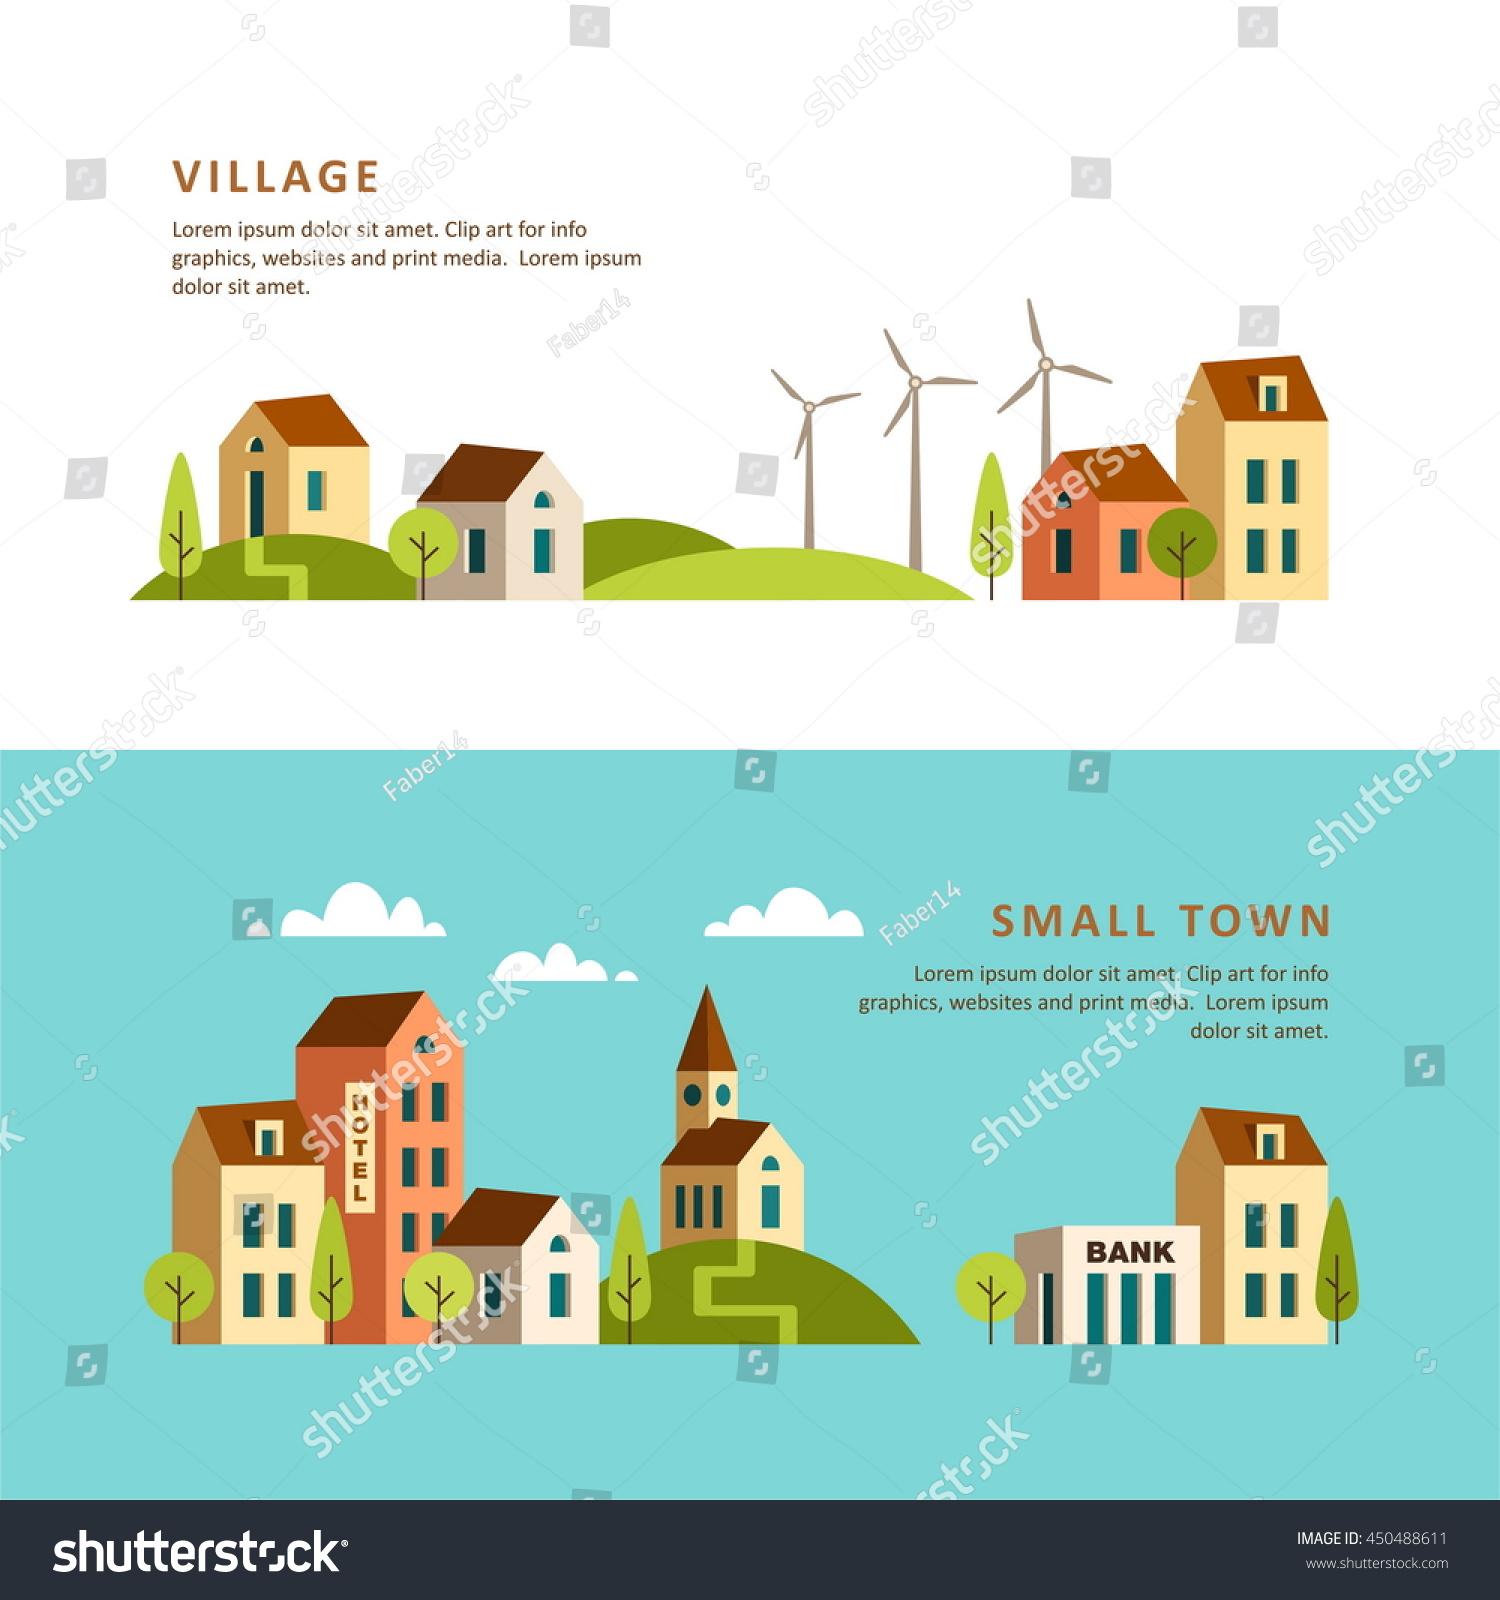 Town Landscape Vector Illustration: Village Small Town Rural Urban Landscape Stock Vector